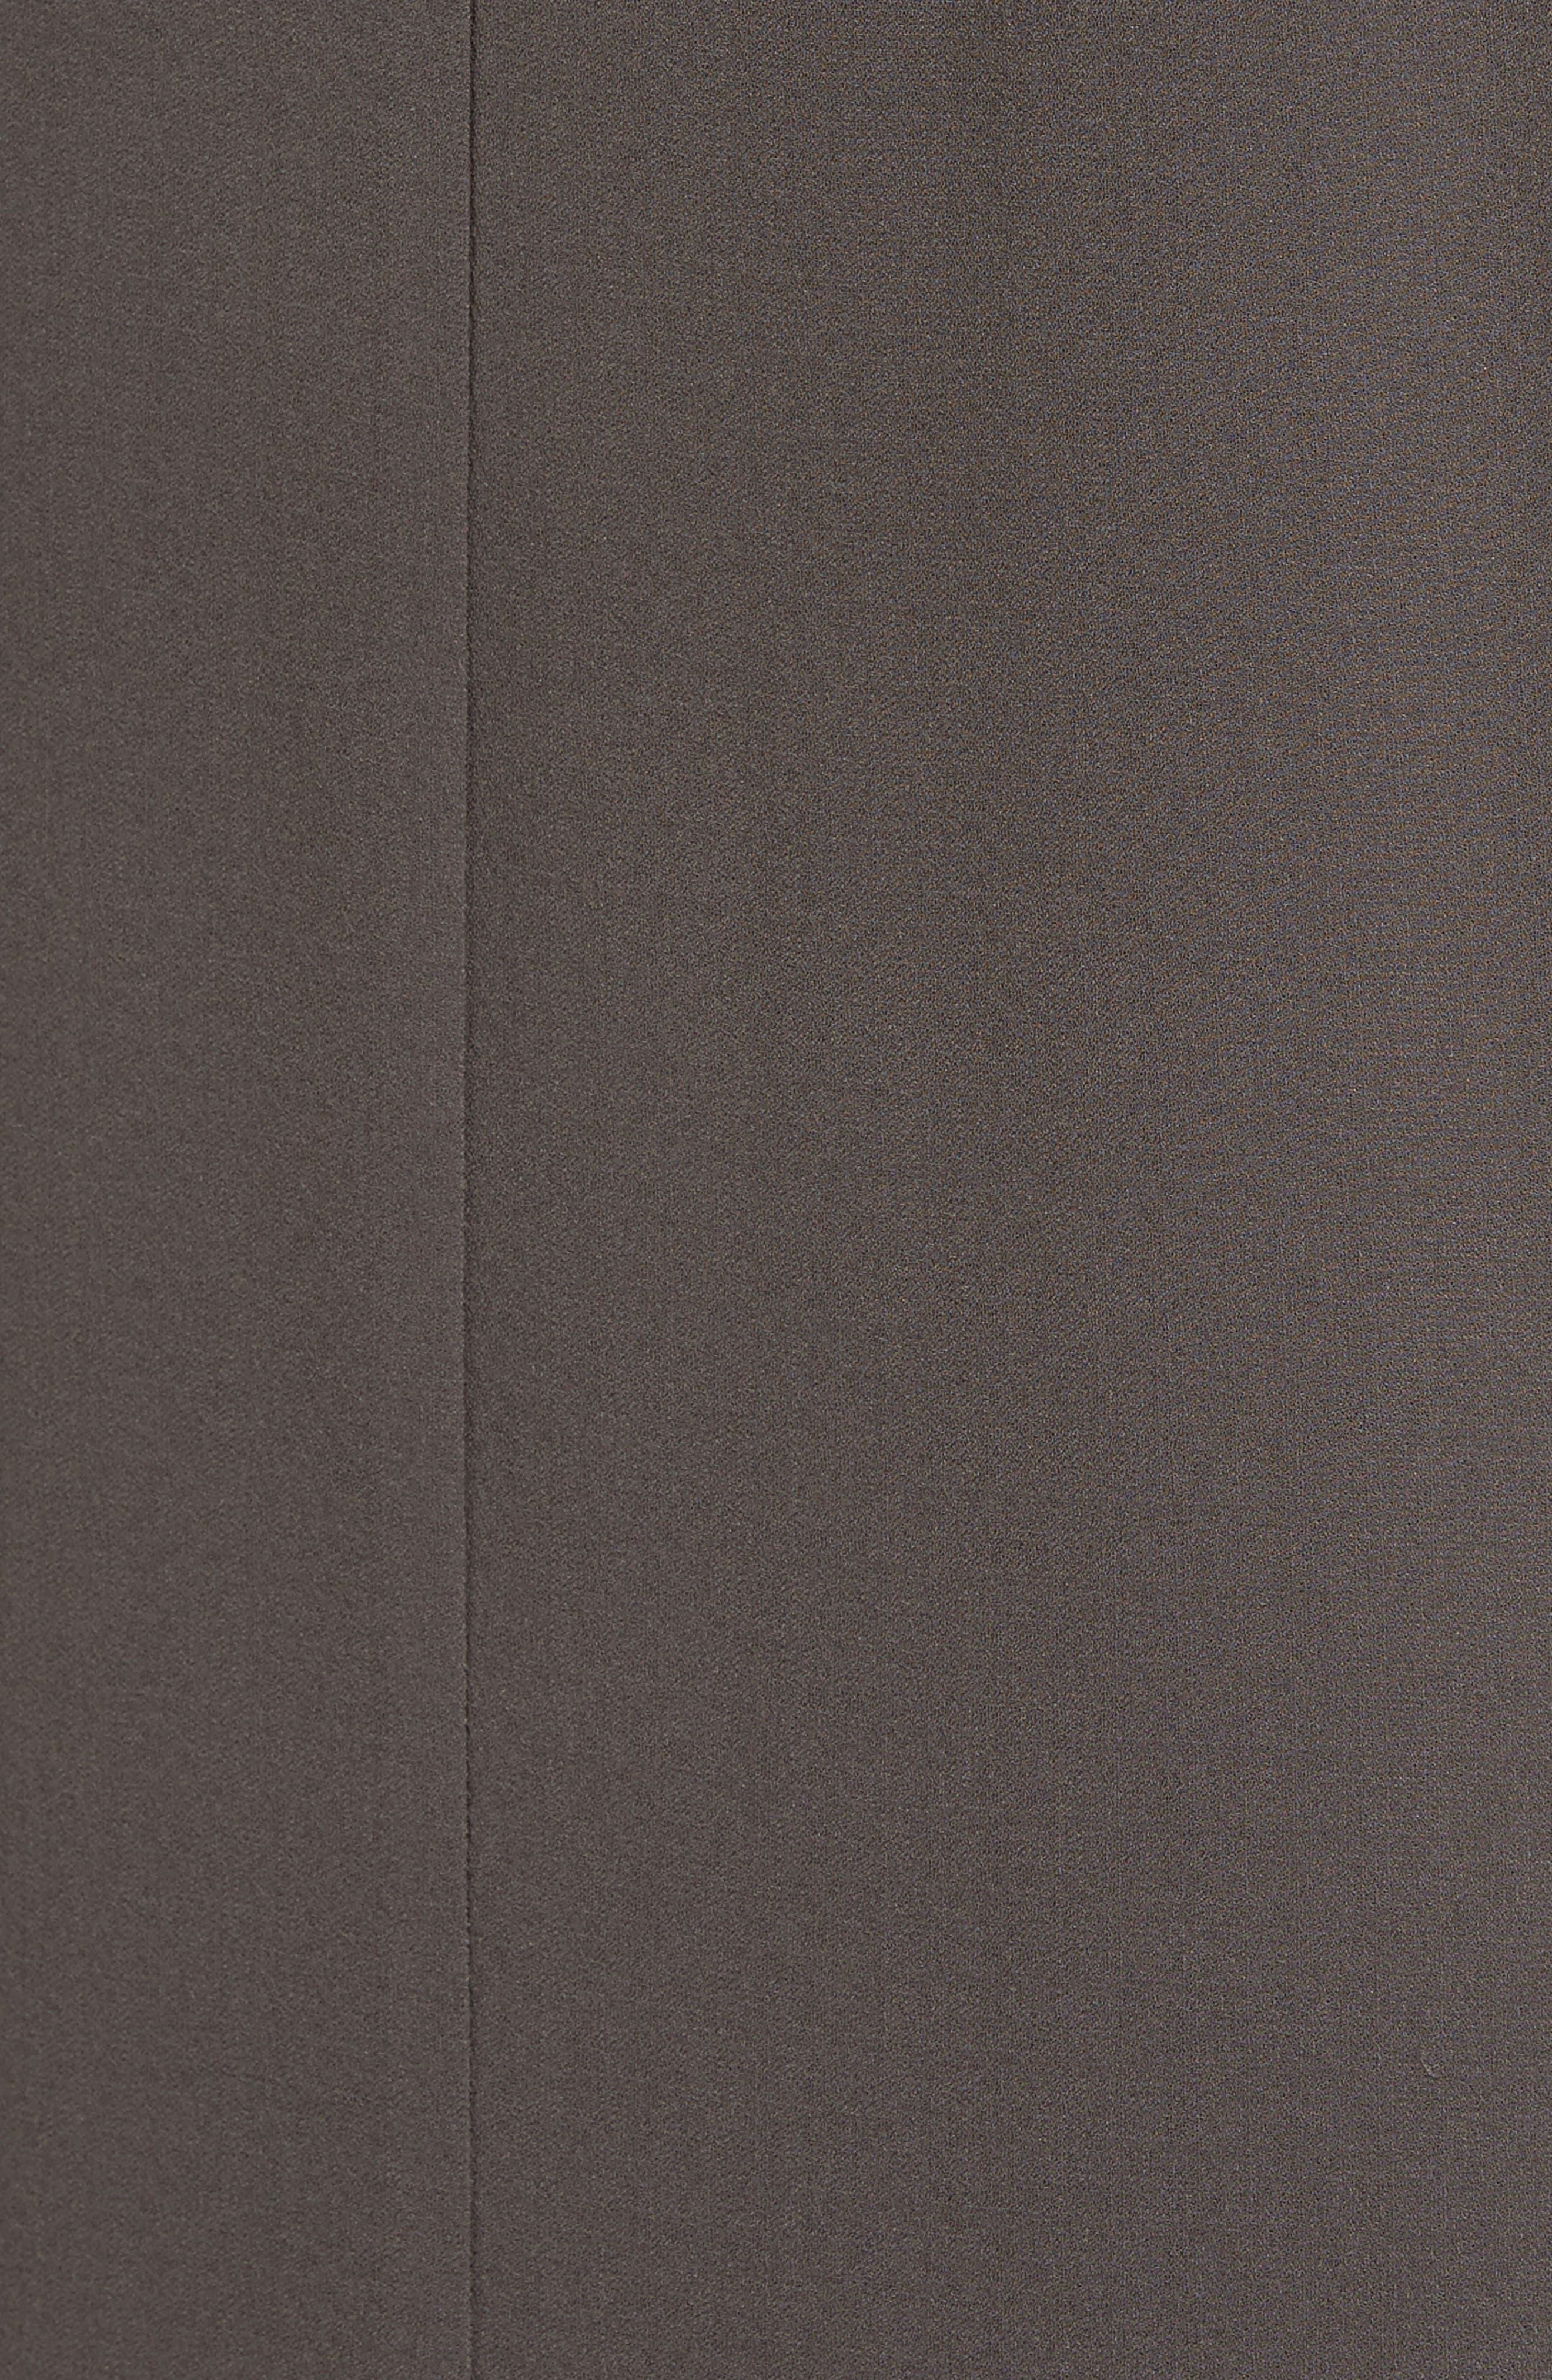 Silk Crepe High Neck Sleeveless Blouse,                             Alternate thumbnail 30, color,